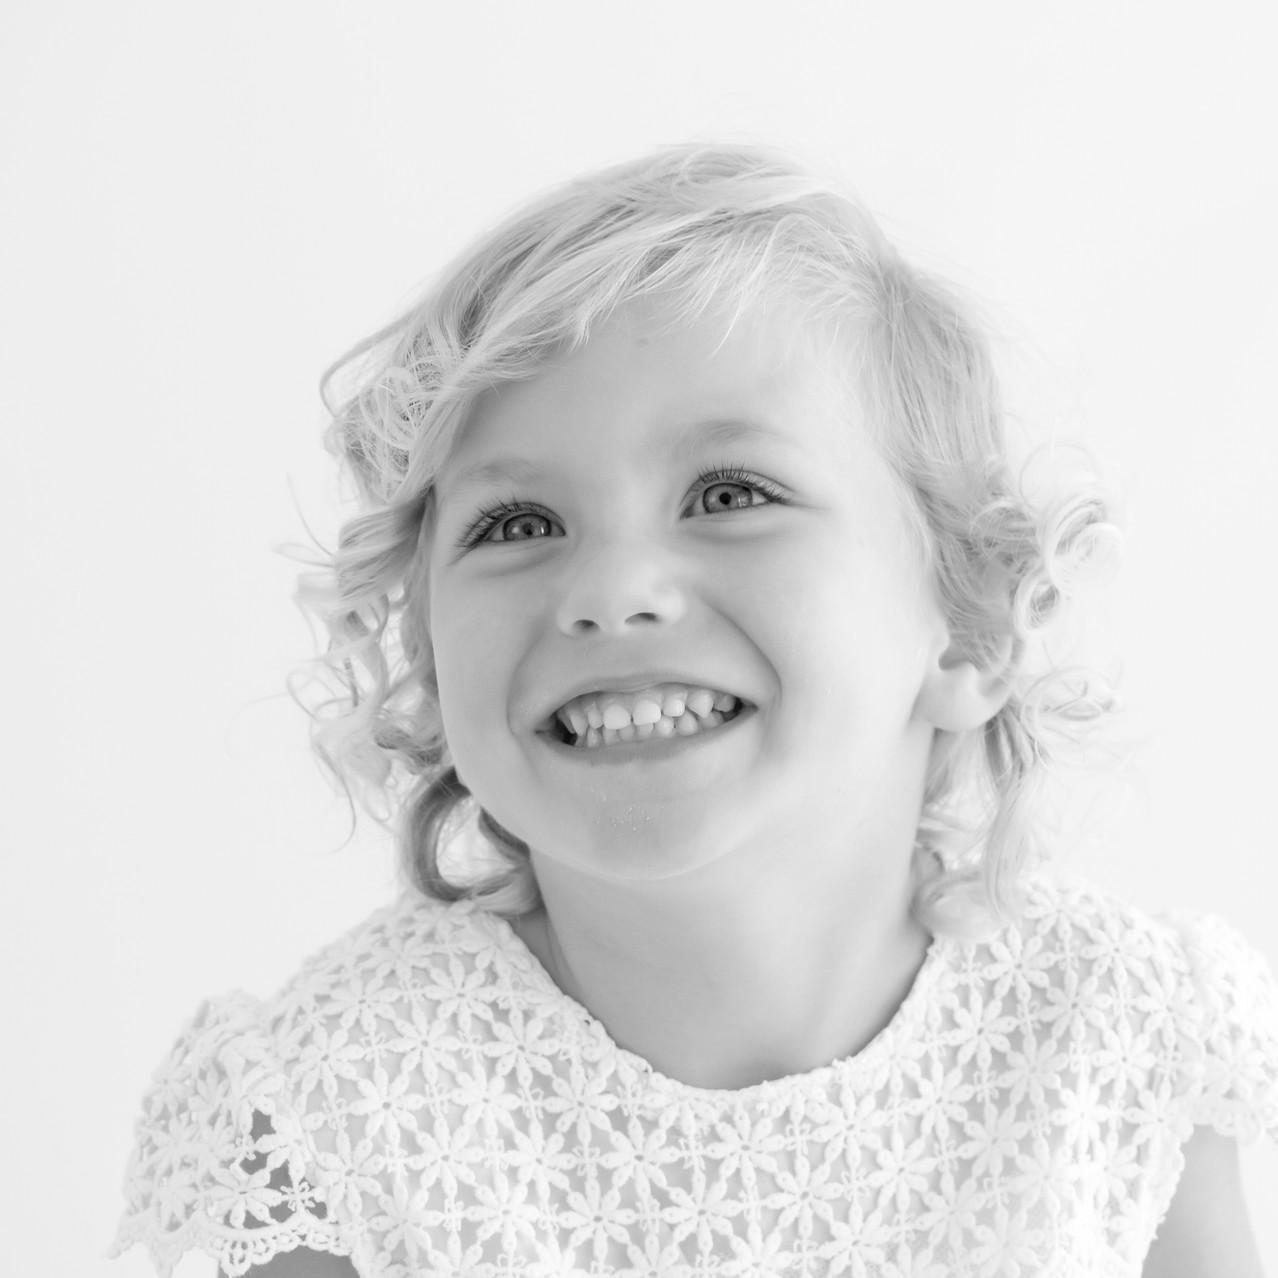 Myah5. Creative Children and baby Photography Studio shoot, Dream Alice Photography & Art, Gold Coast